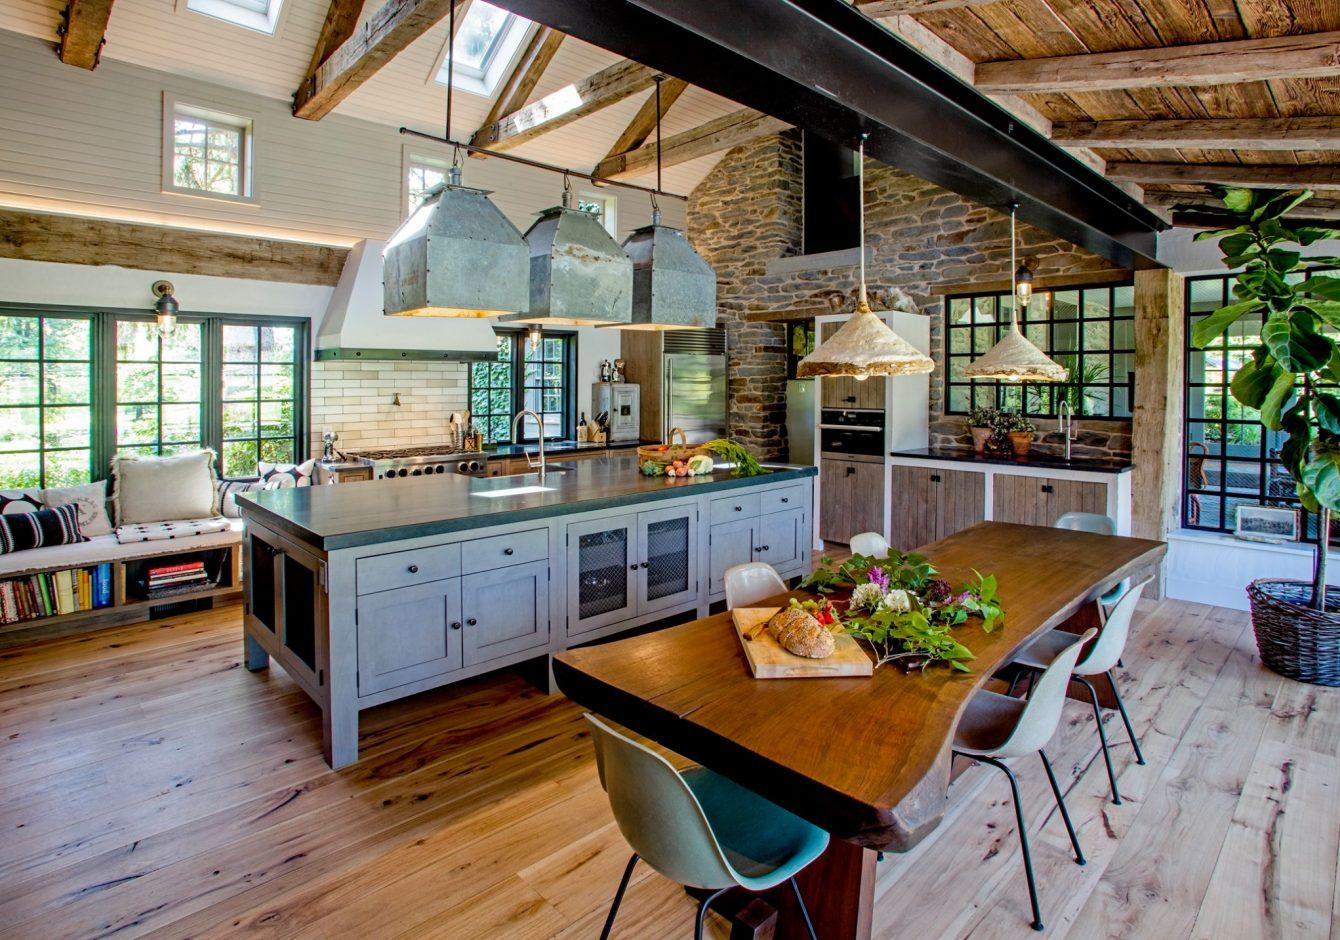 """Grand Textured Charm""- Bedminster Historic Farmhouse Kitchen Renovation"